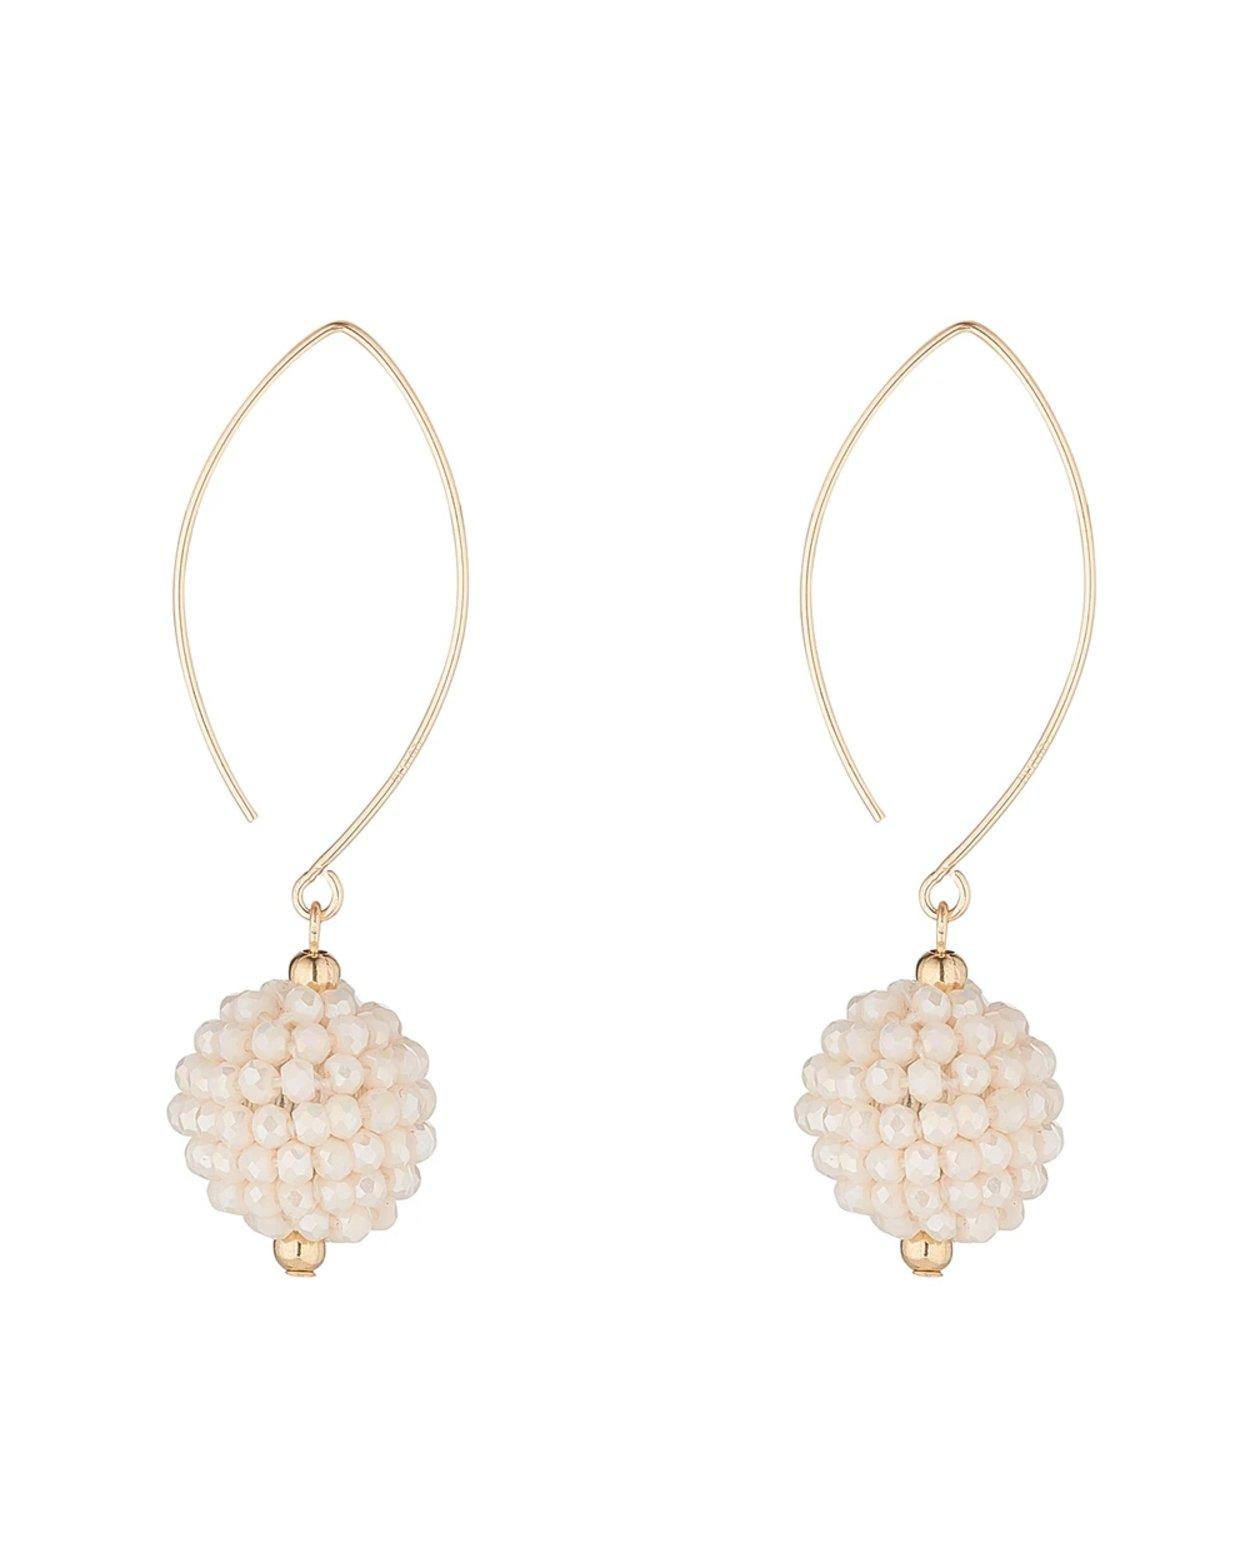 14kt Gold Filled Cream Cluster Charm Earrings